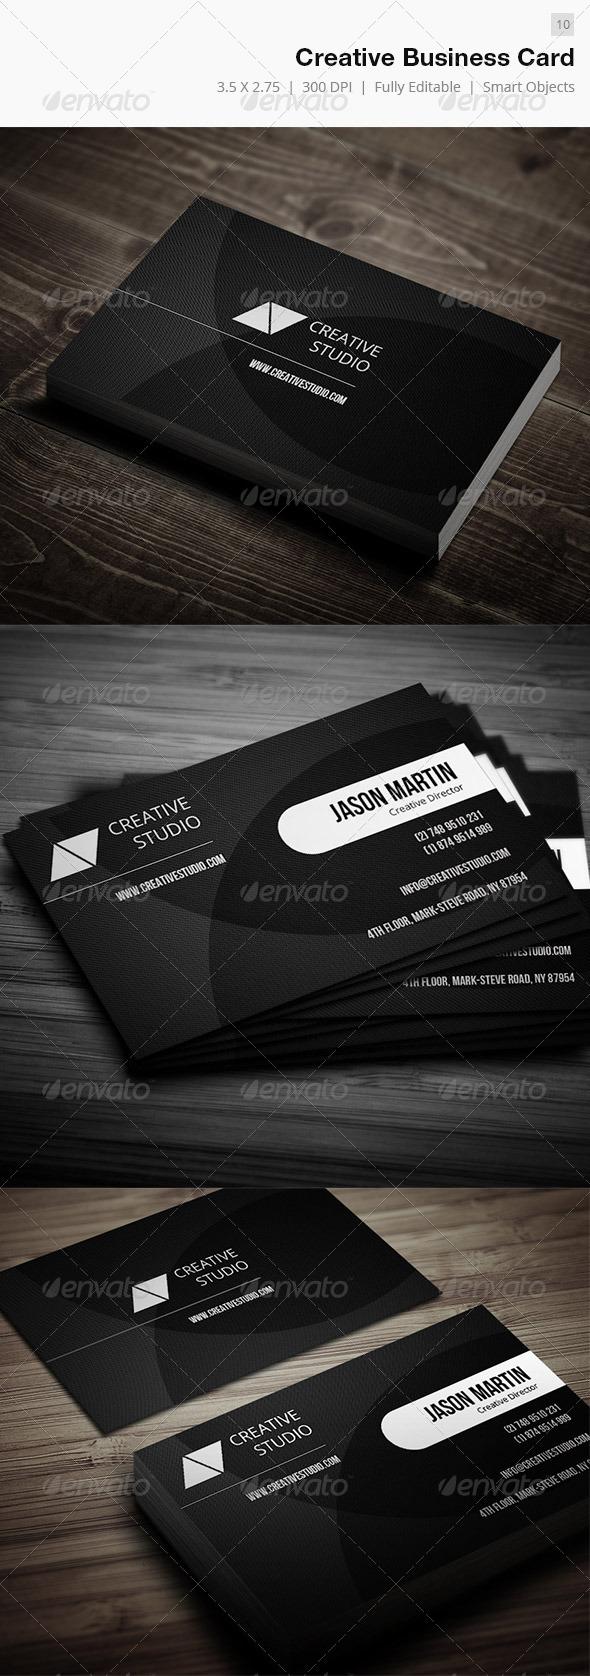 GraphicRiver Creative Business Card 10 5006039